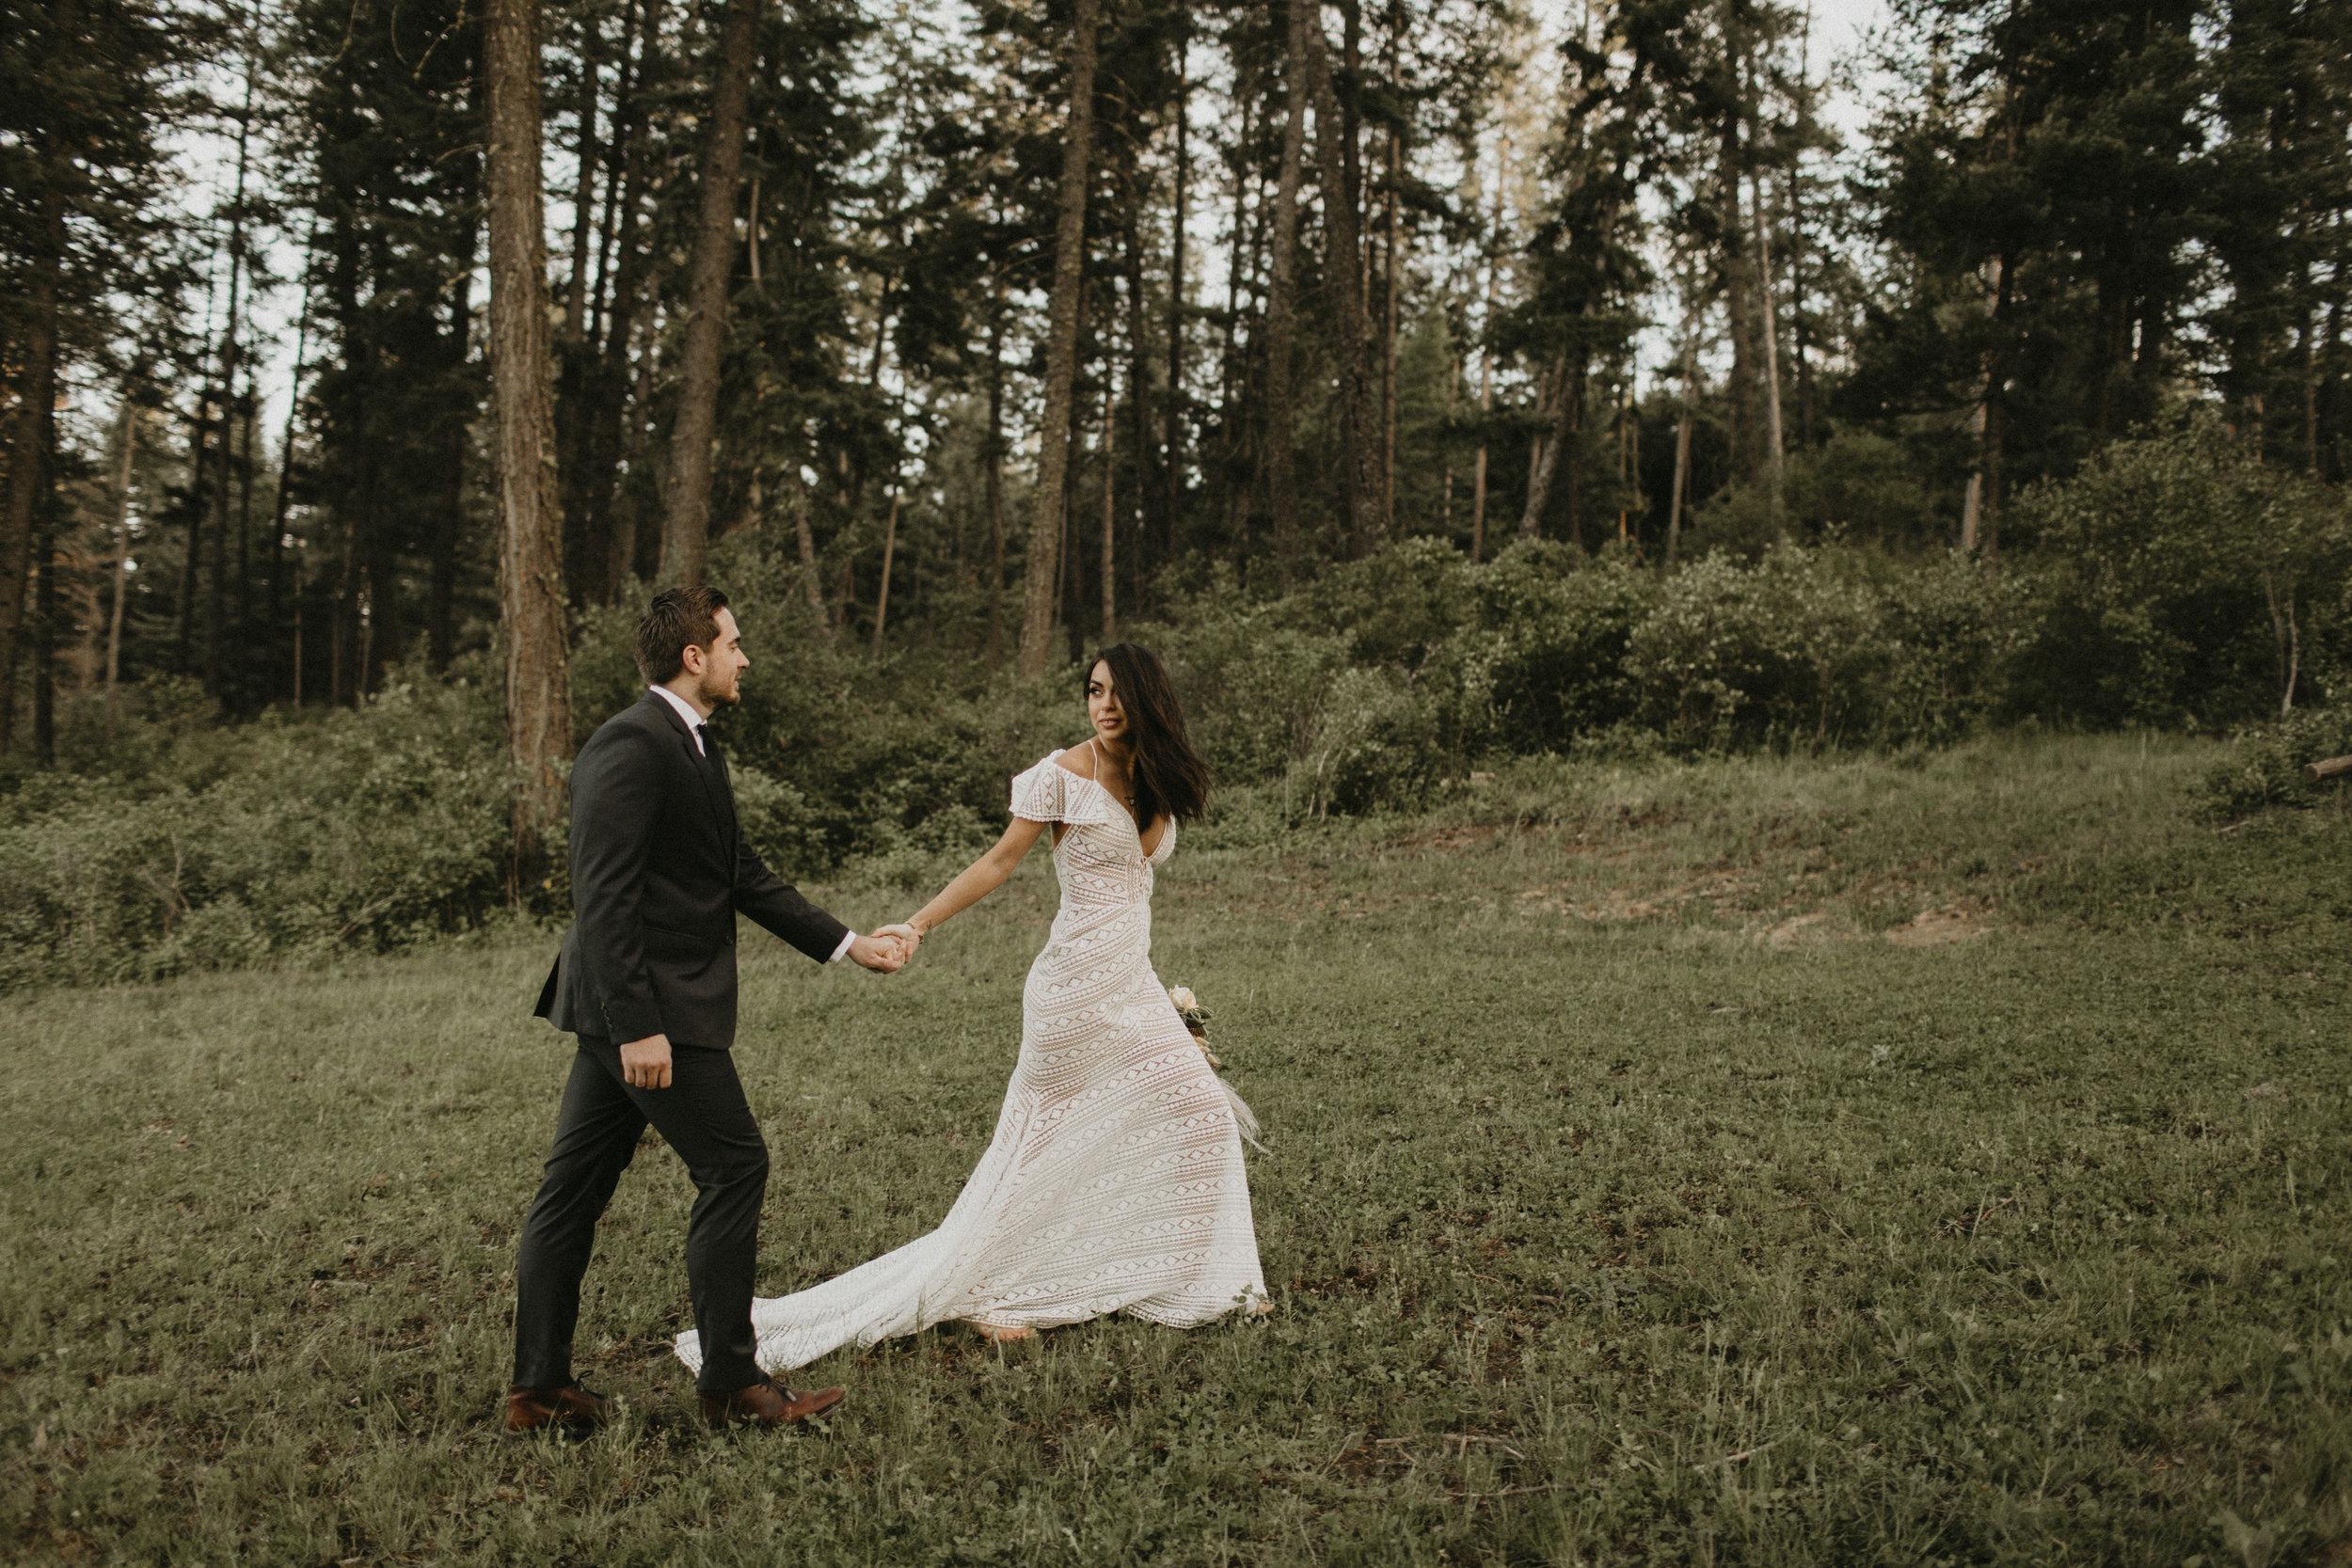 Spokane boho cattle wedding running away elopement bride and groom